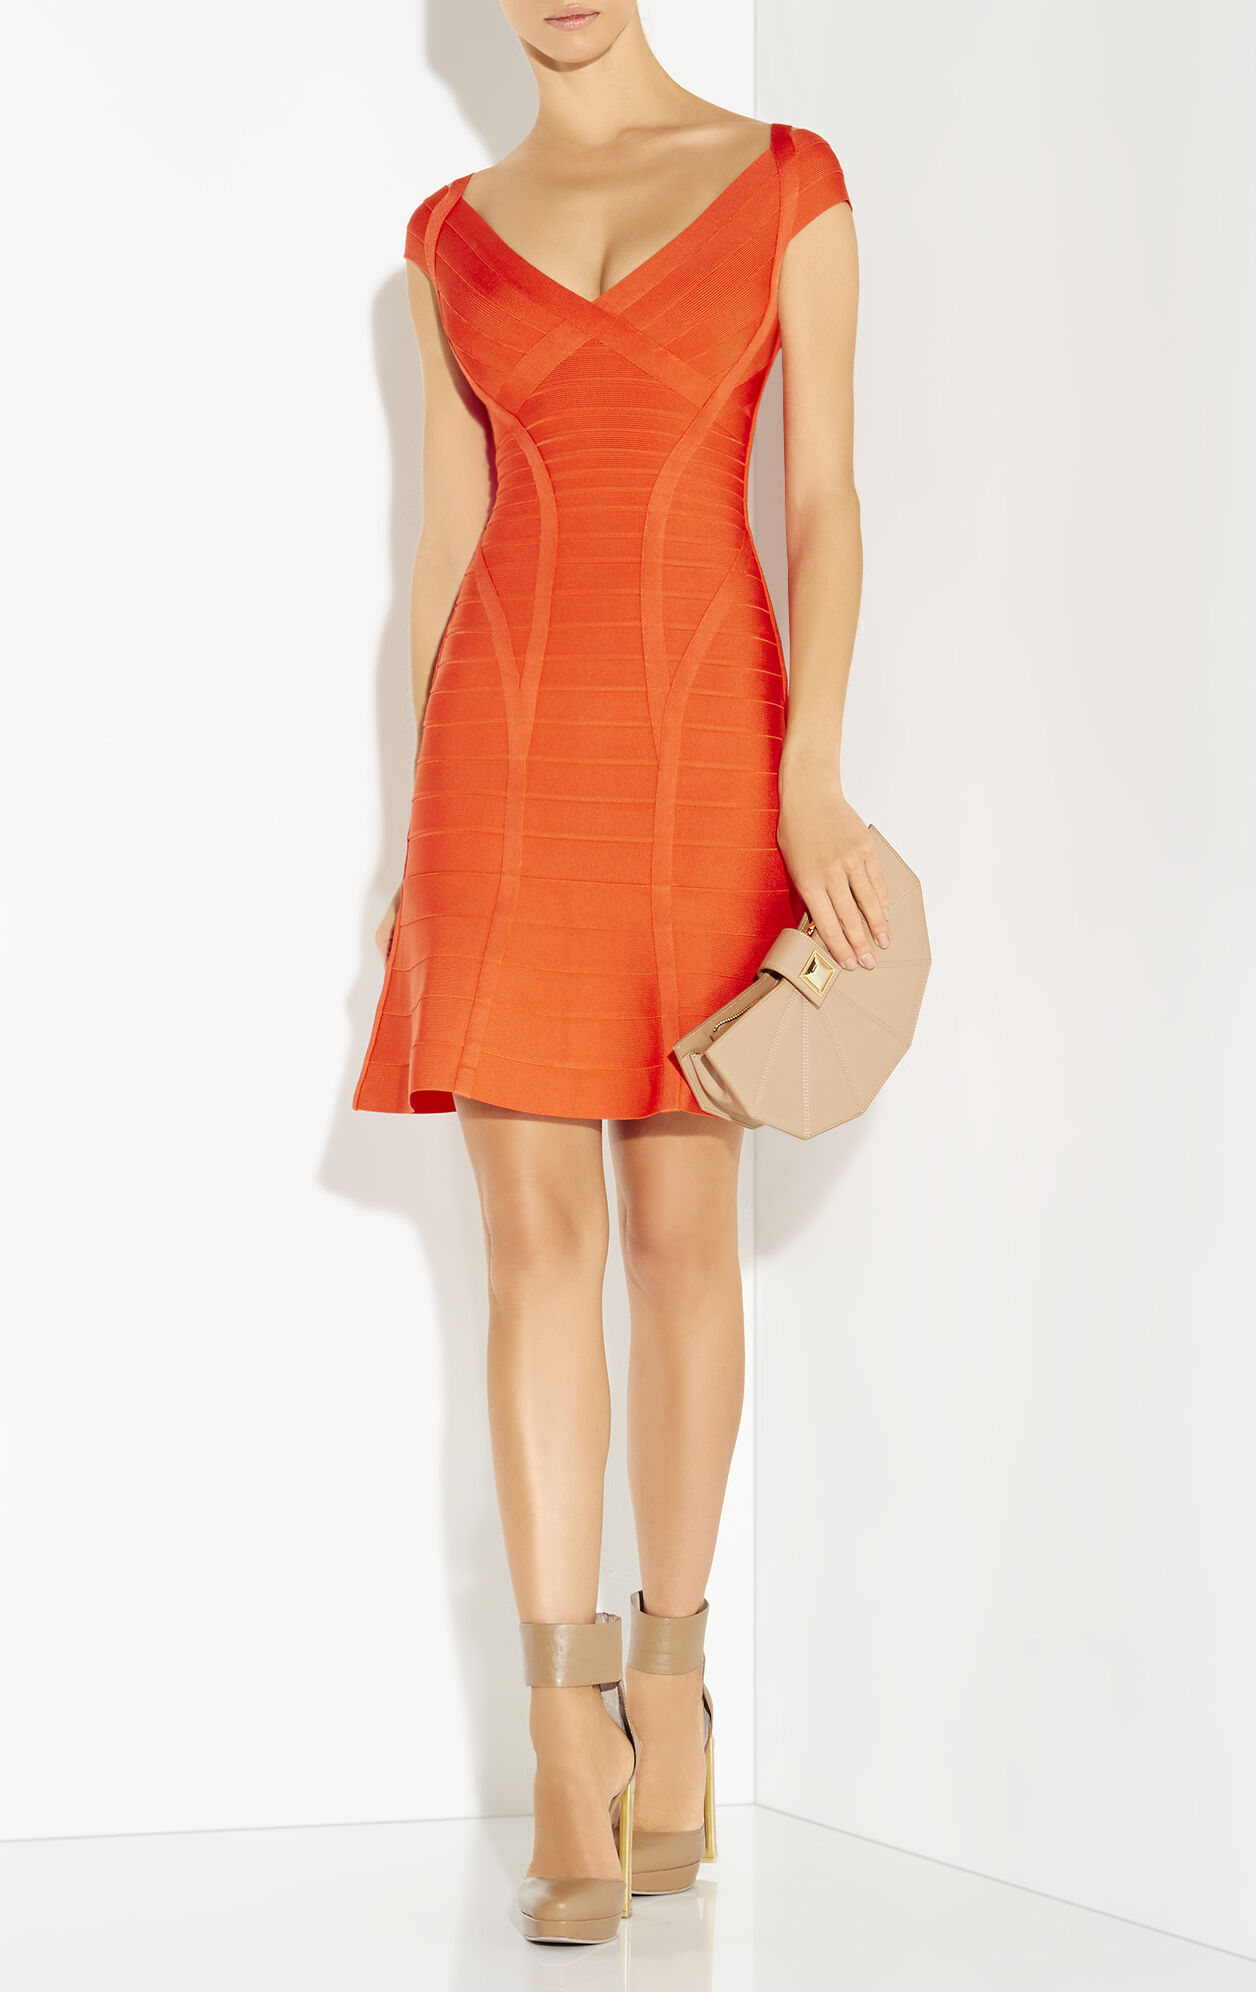 Ontoria Signature Essentials Dress